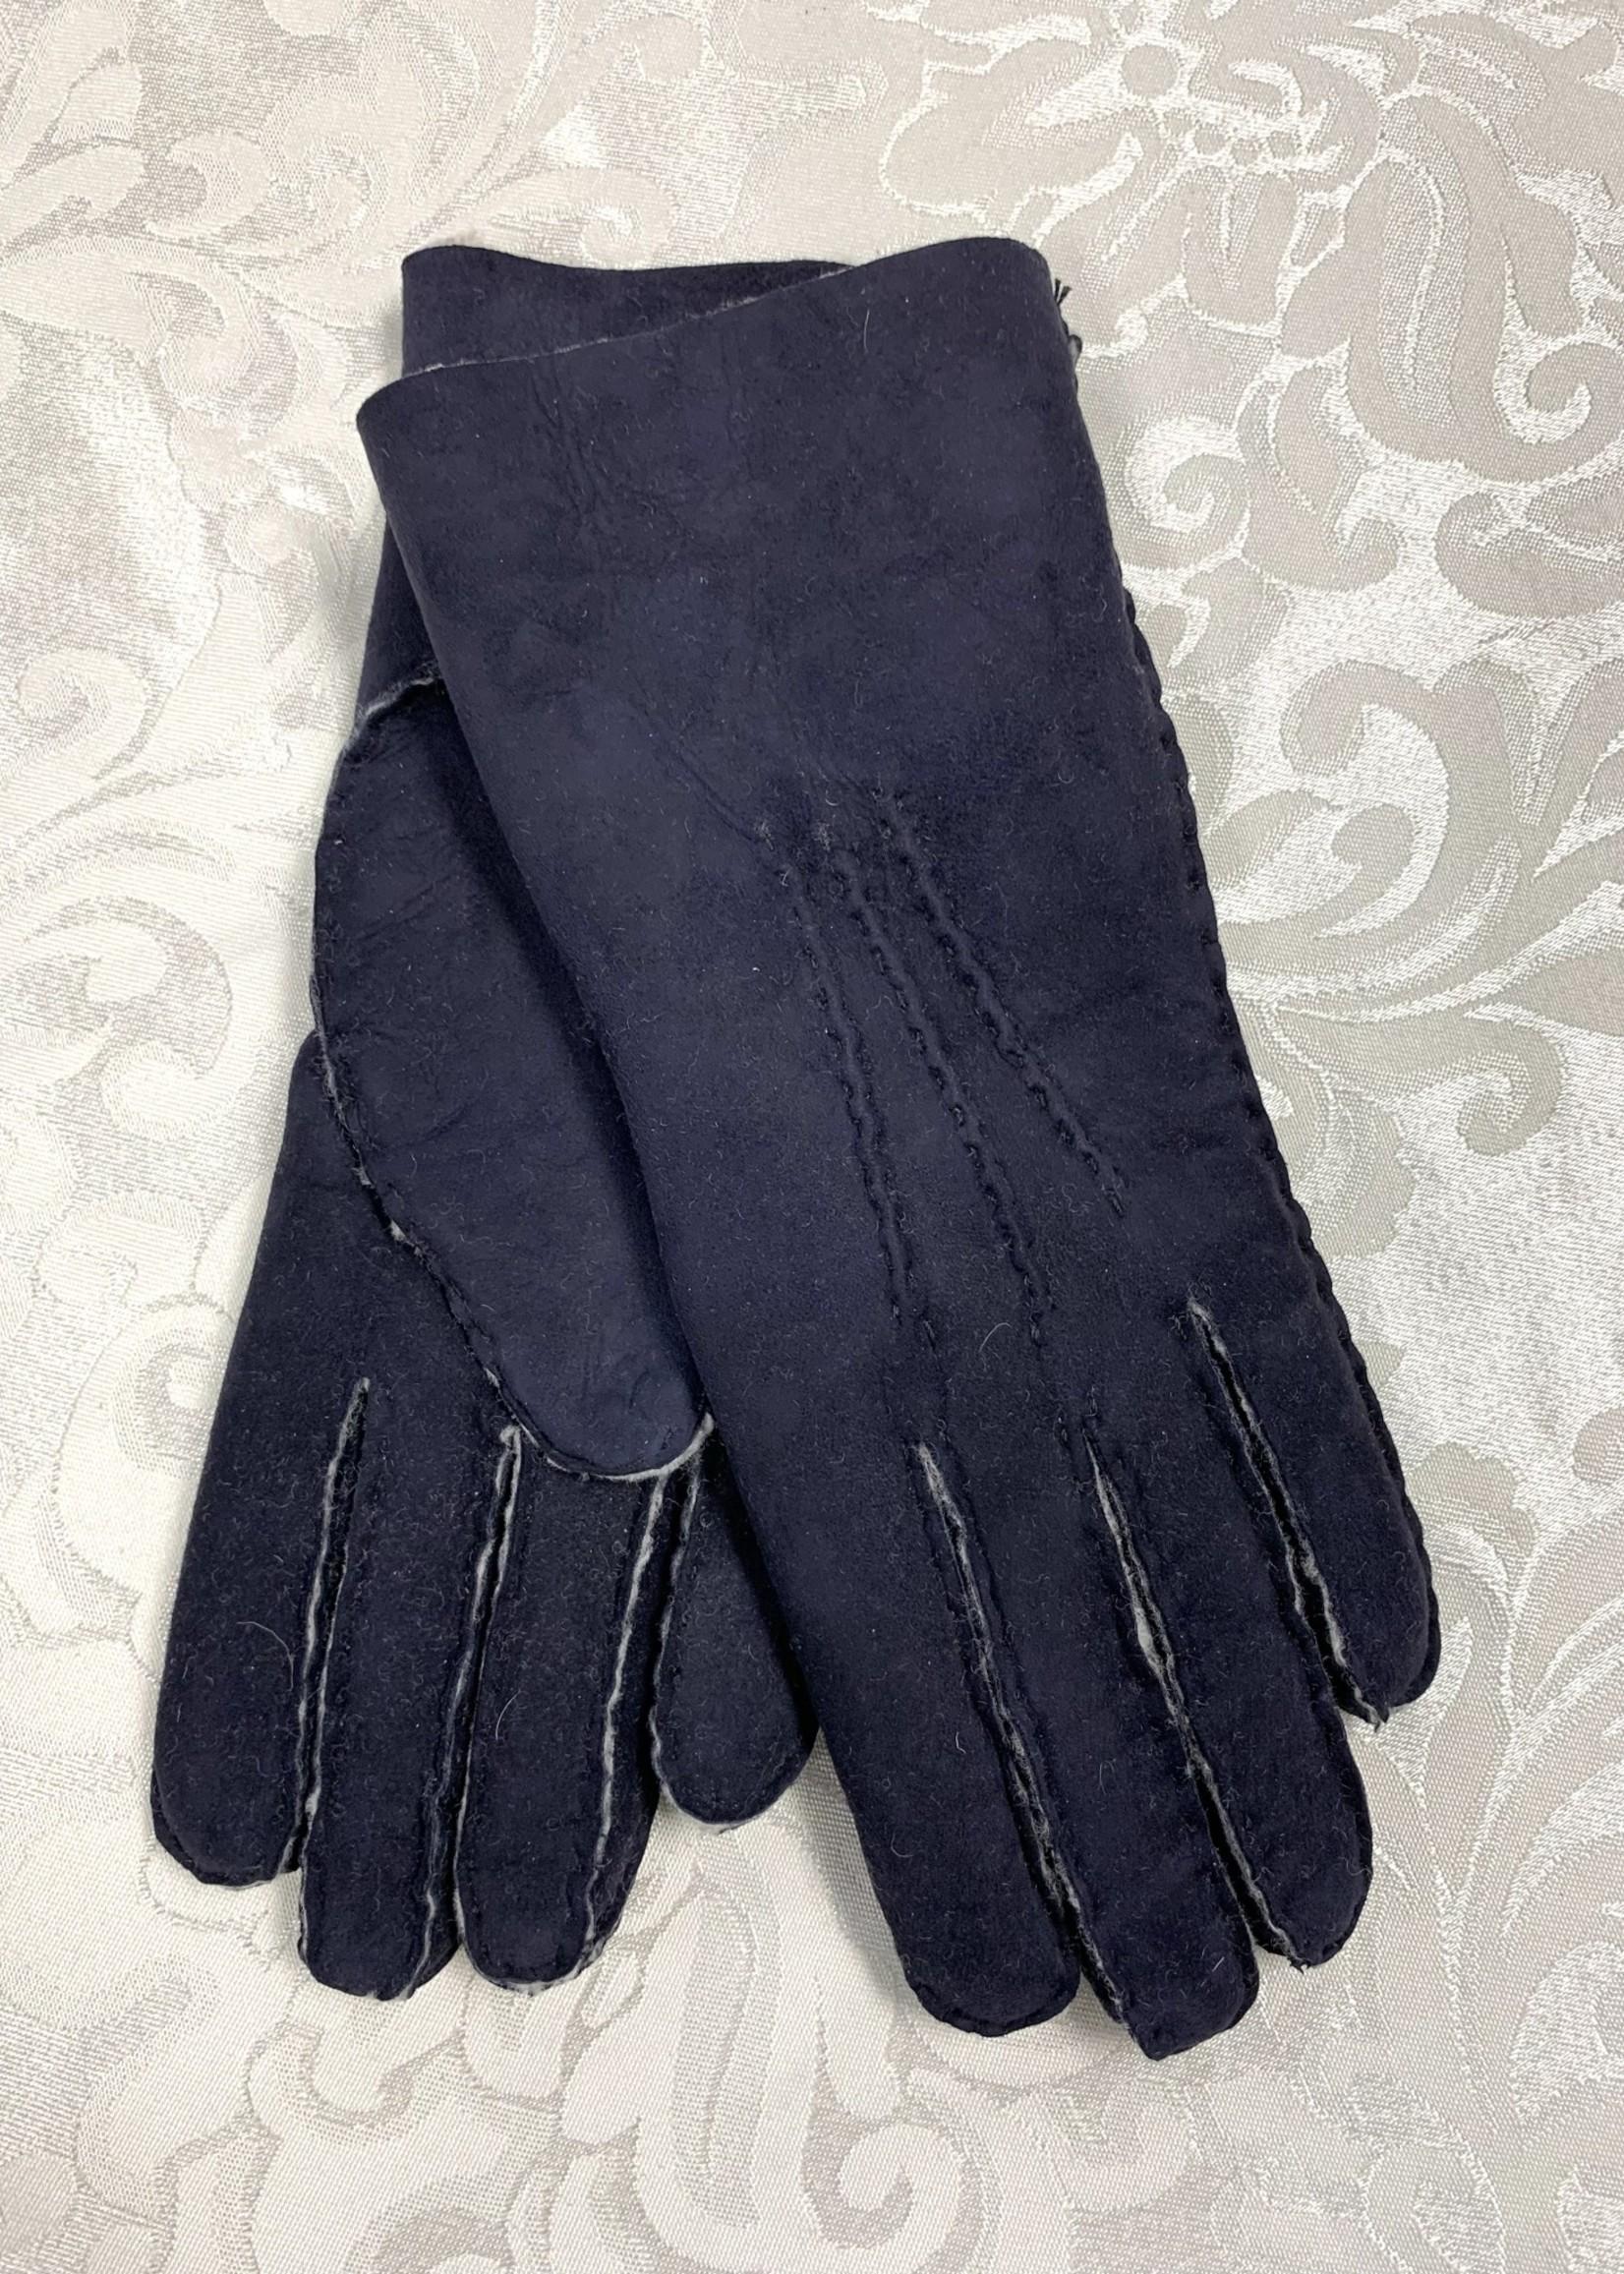 Albee Sheepskin Gloves Navy